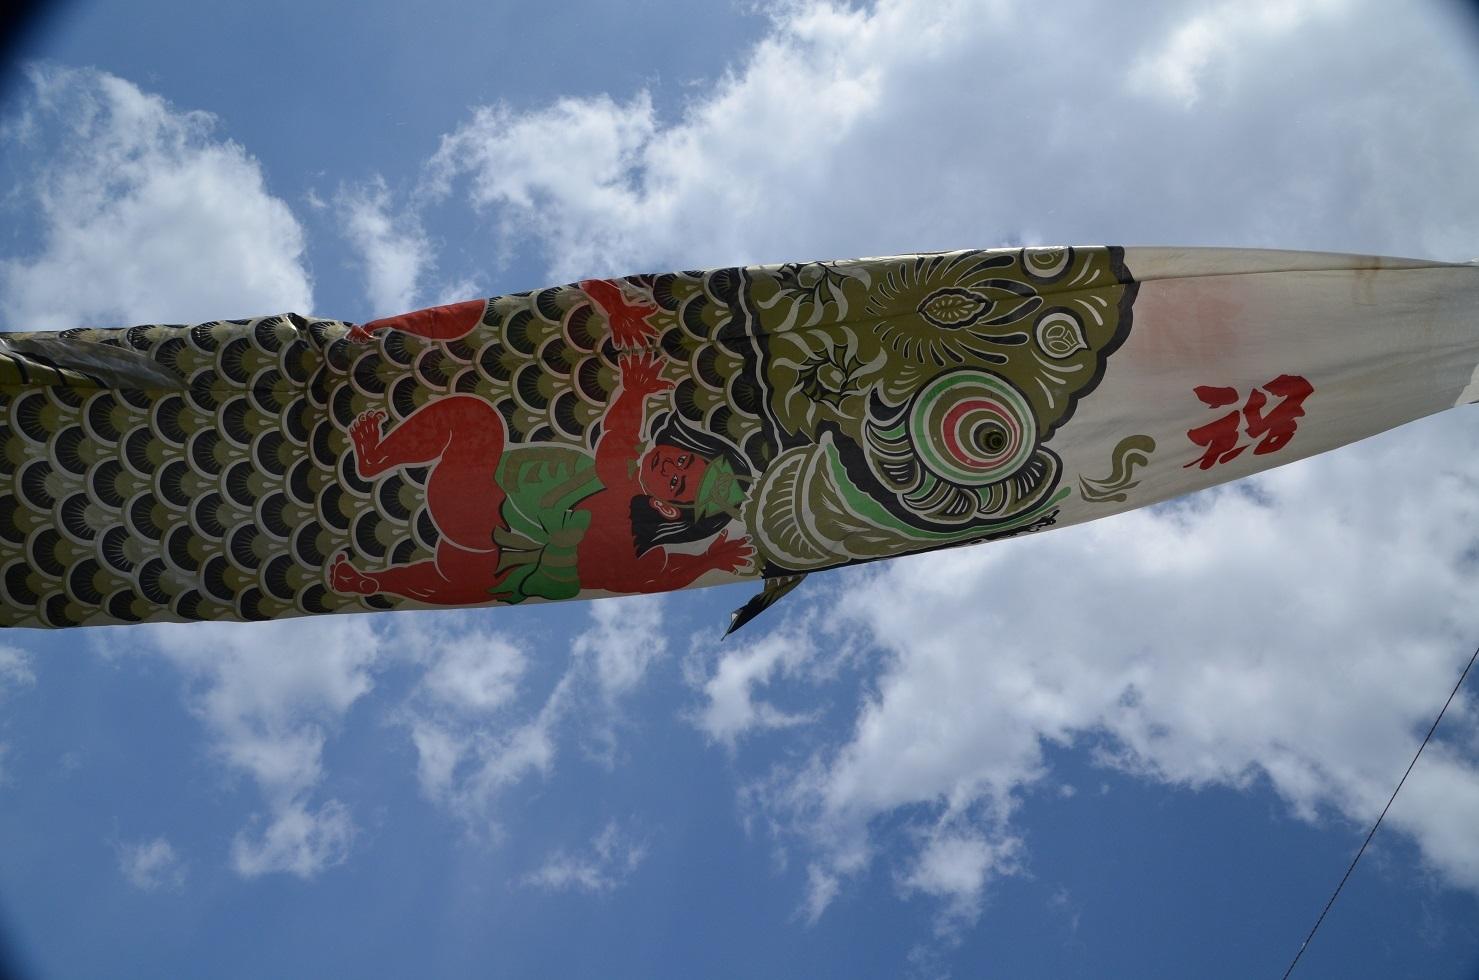 DSC_0338金太郎の鯉のぼり